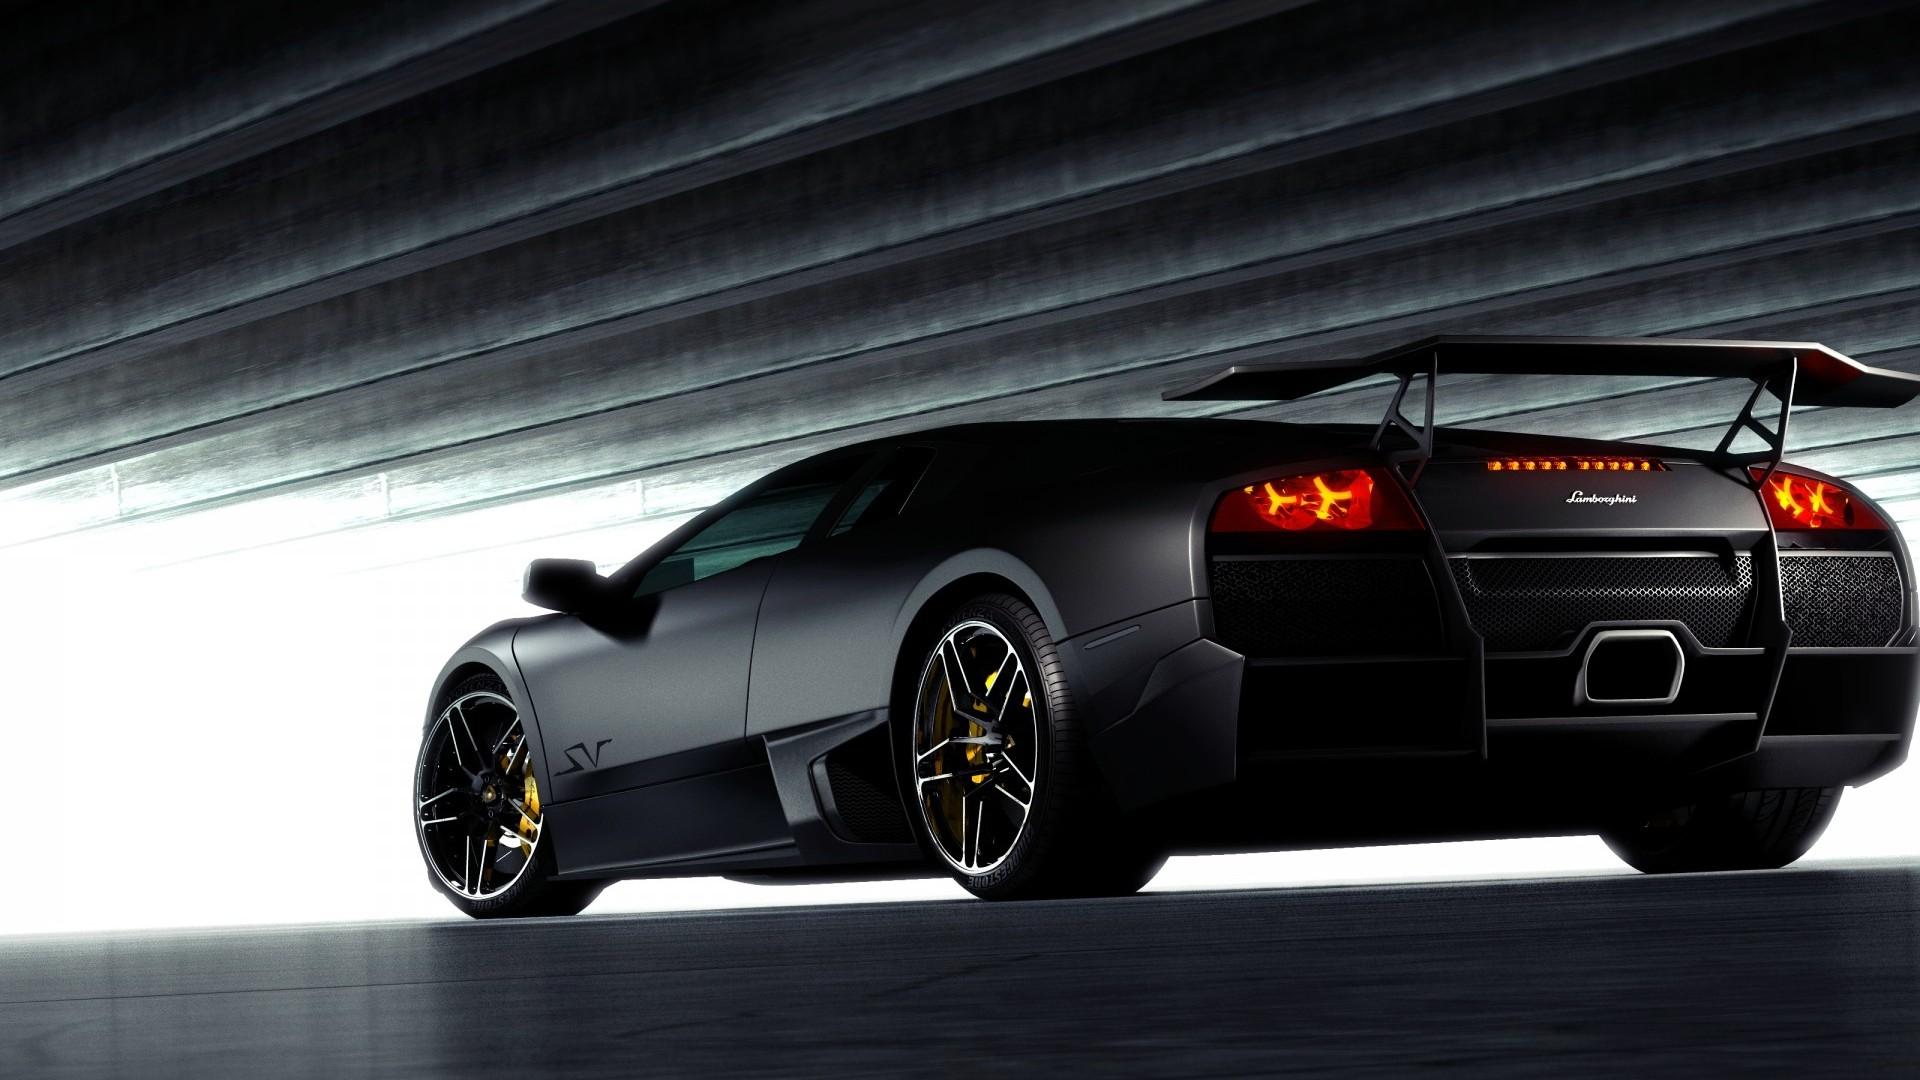 black-lamborghini-back-view-hd-wallpapers-1080p-cars ...